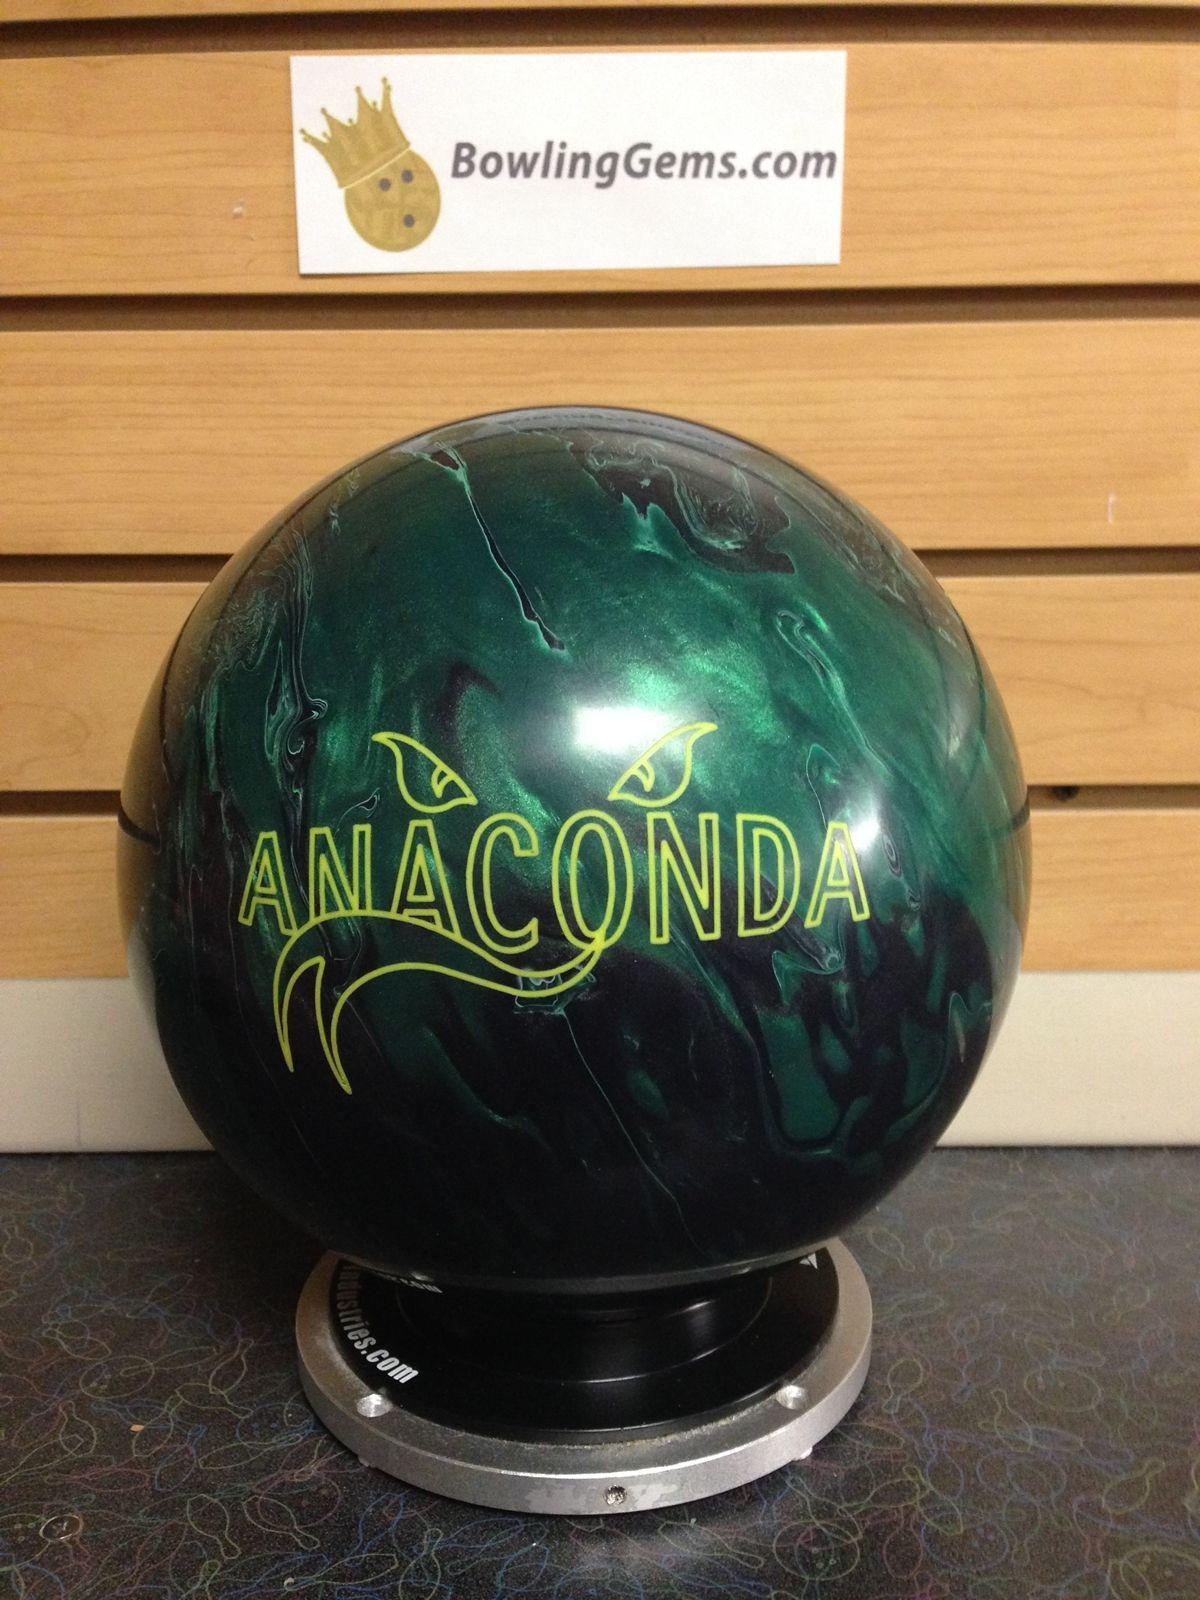 Brunswick Anaconda 15 Lbs Nib Http Www Bowlinggems Com Product Brunswick Anaconda 15 Lbs Nib Bowling Bowling Balls Ball